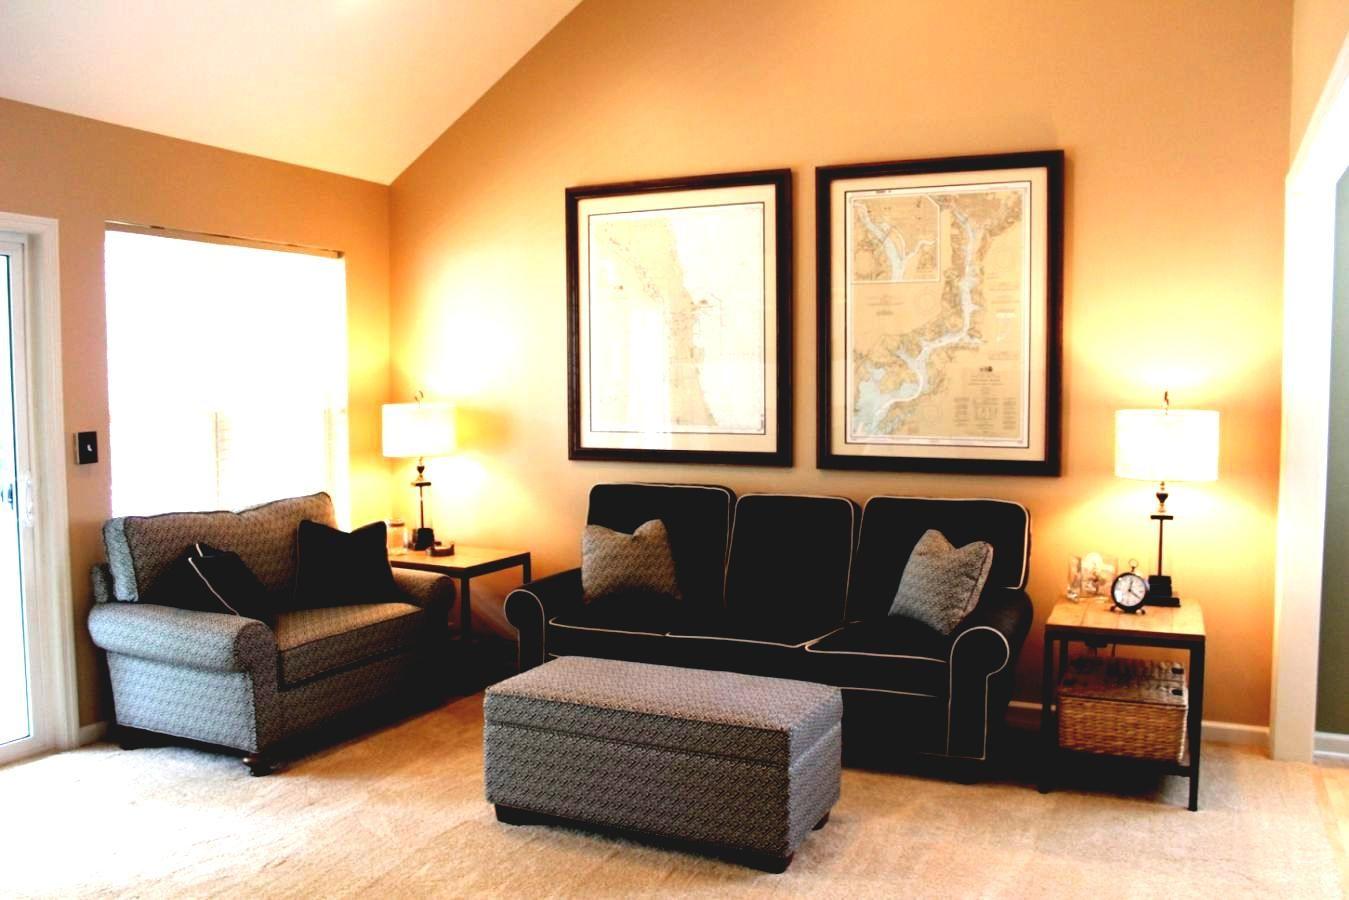 modern interior painting ideas living room wall color on interior wall colors ideas id=28566